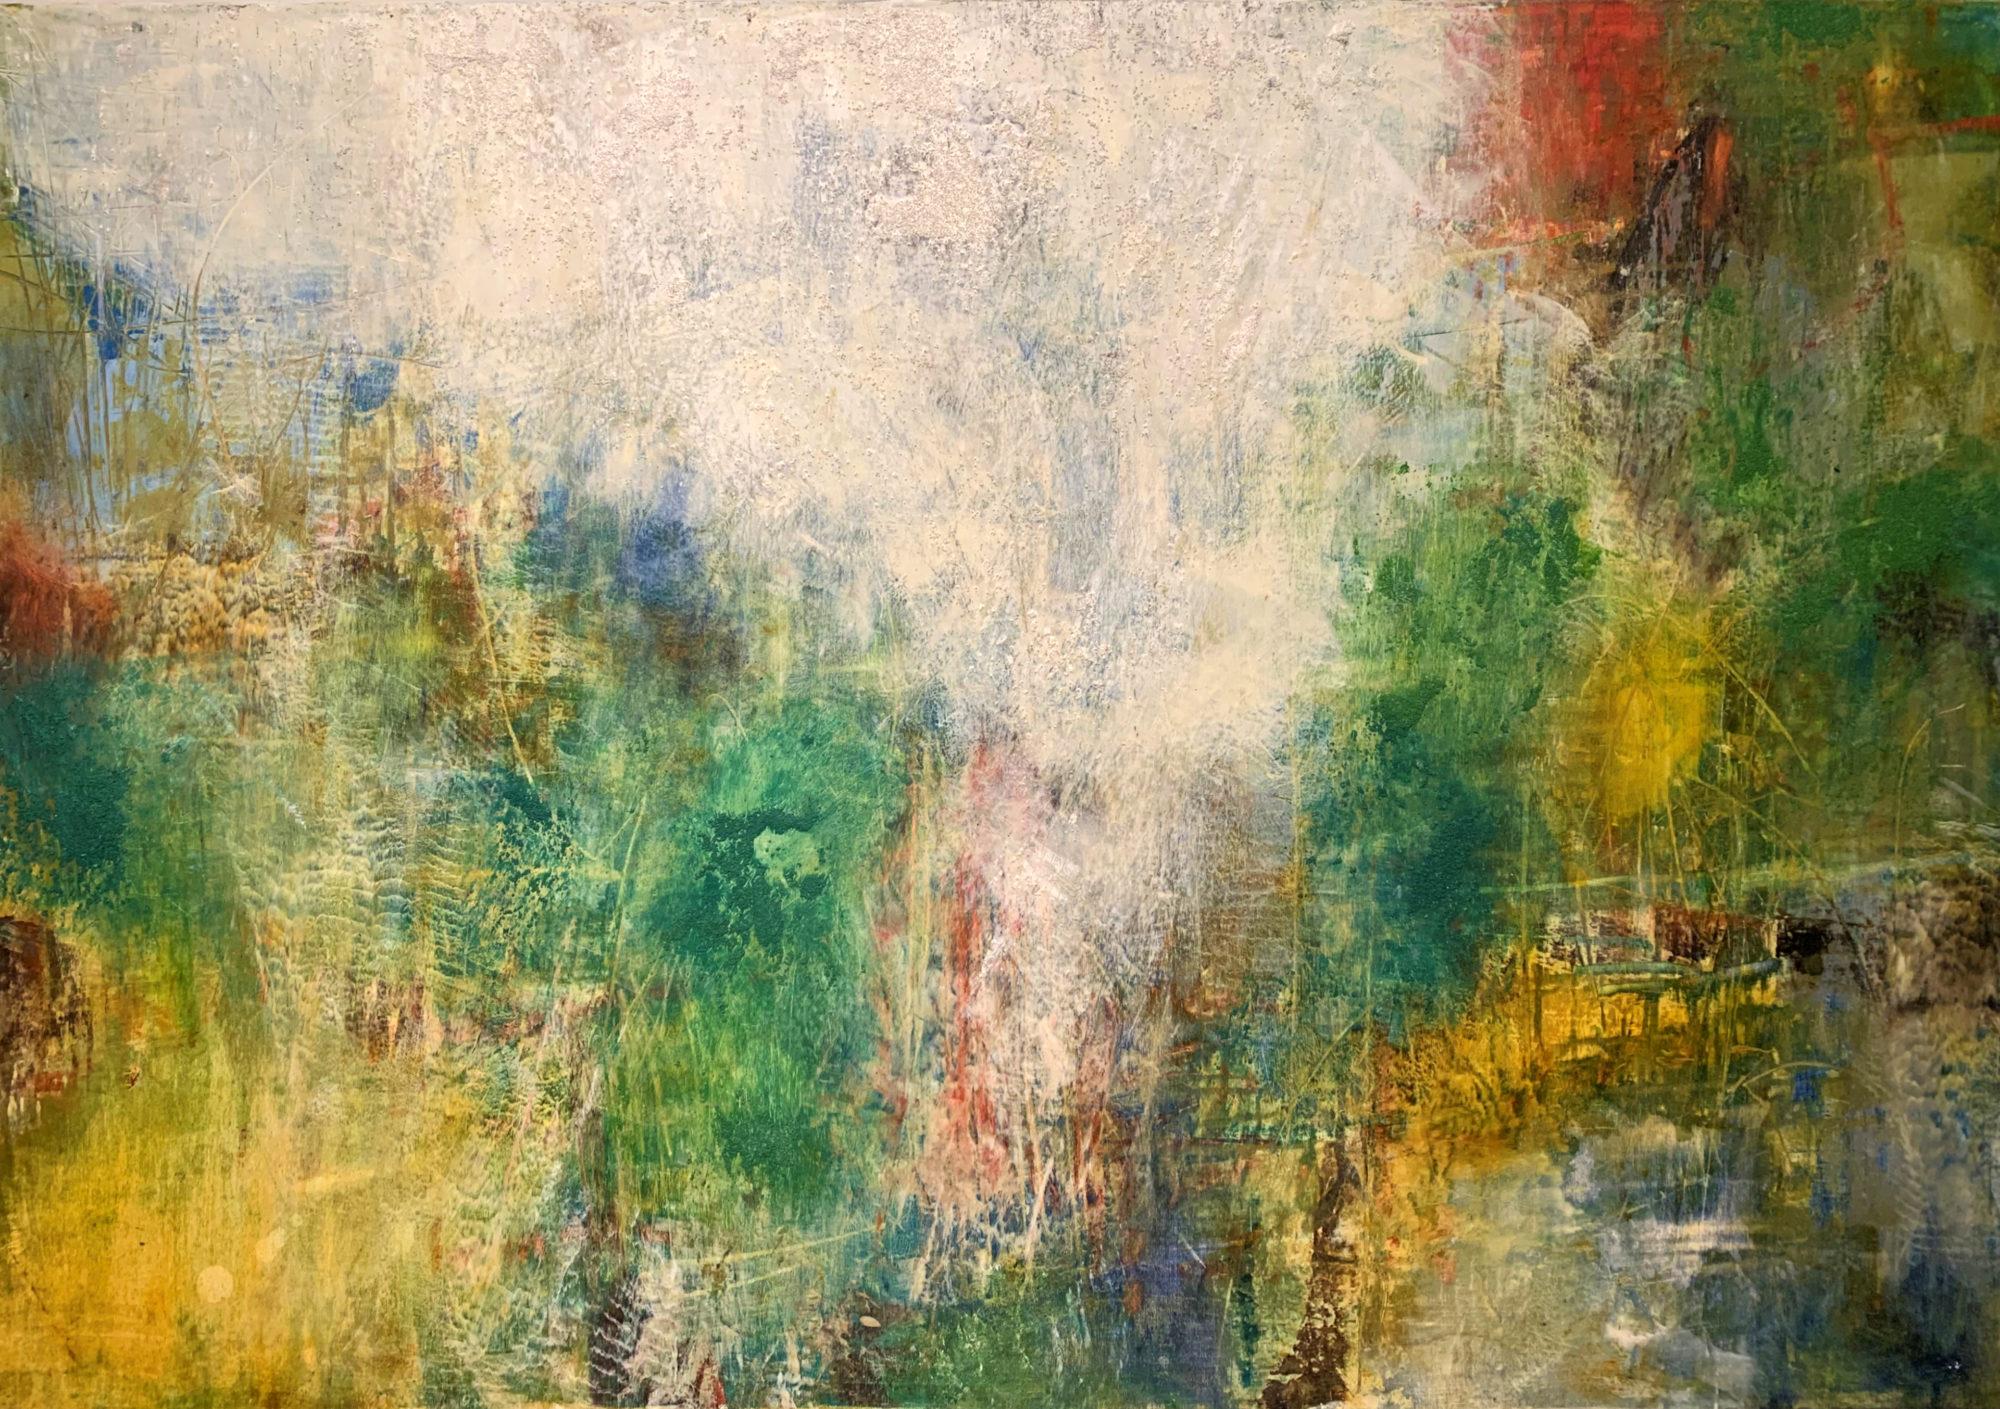 Patina Wall I 70 x 100 oil & cold wax